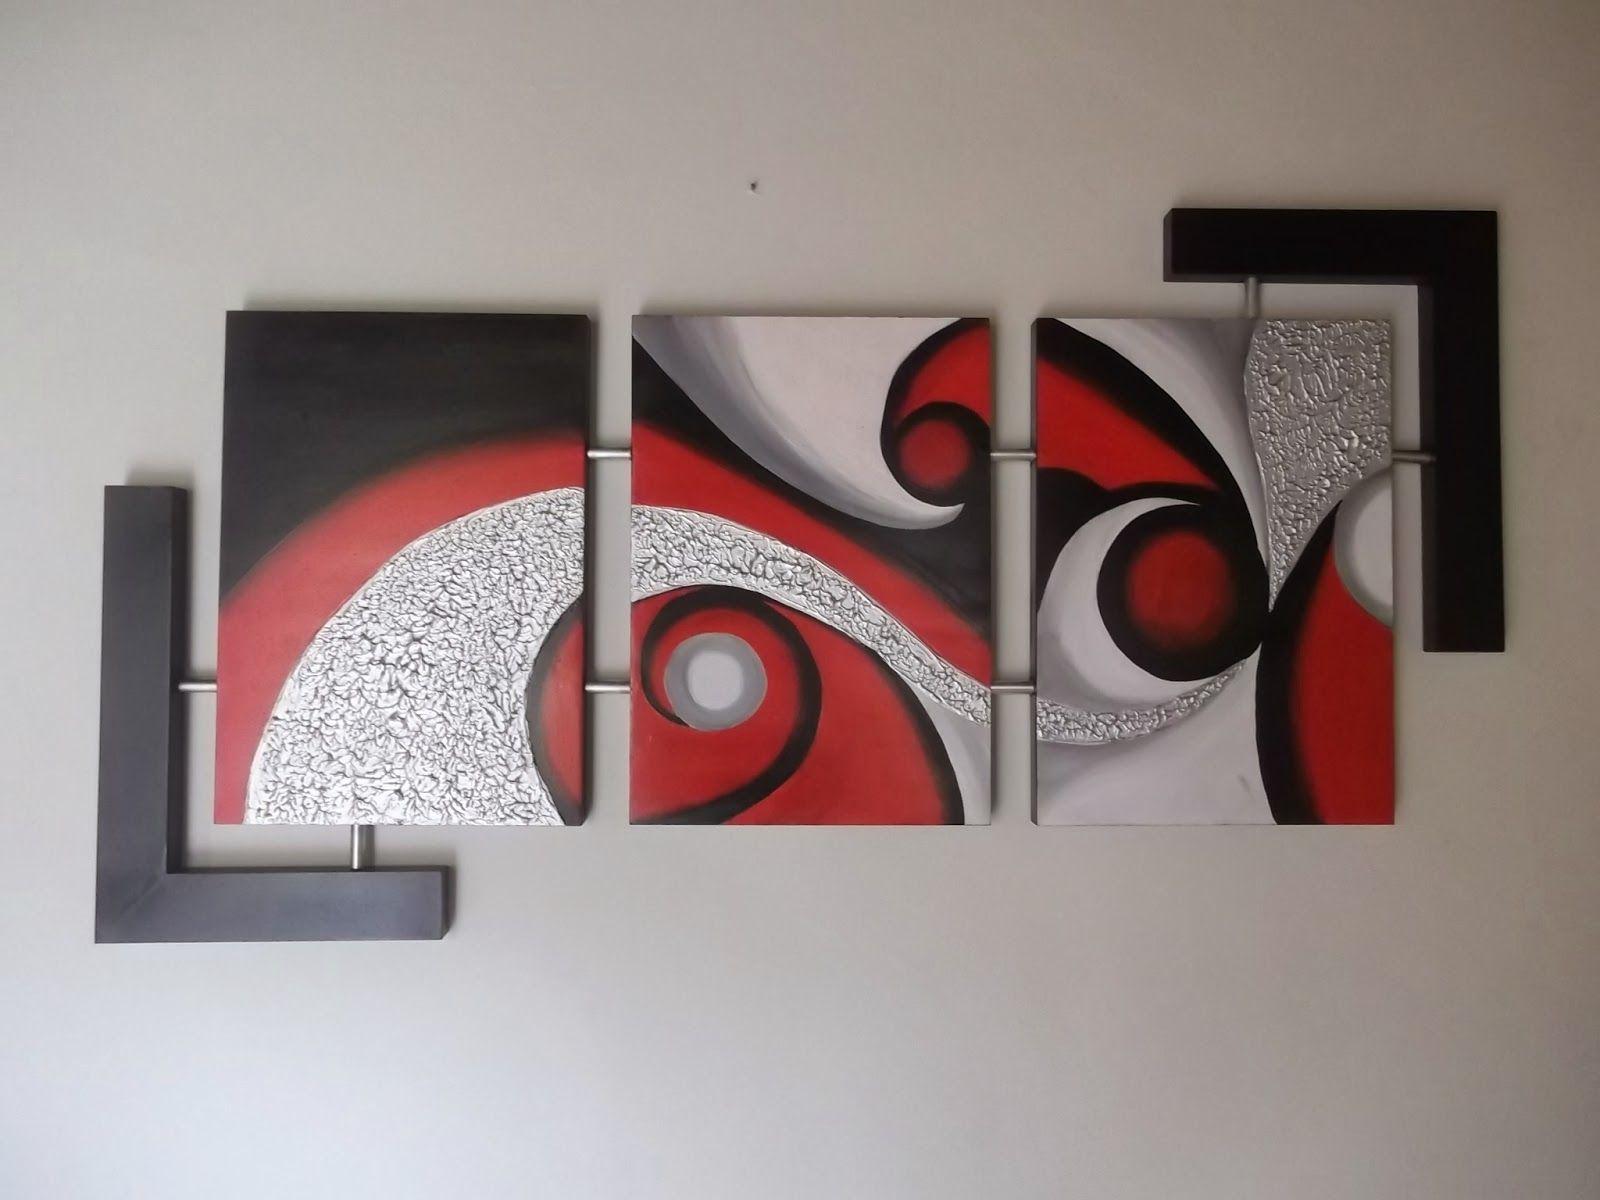 Tecnicas para hacer cuadros abstractos paso a paso - Cuadros decorativos para cocina abstractos modernos ...